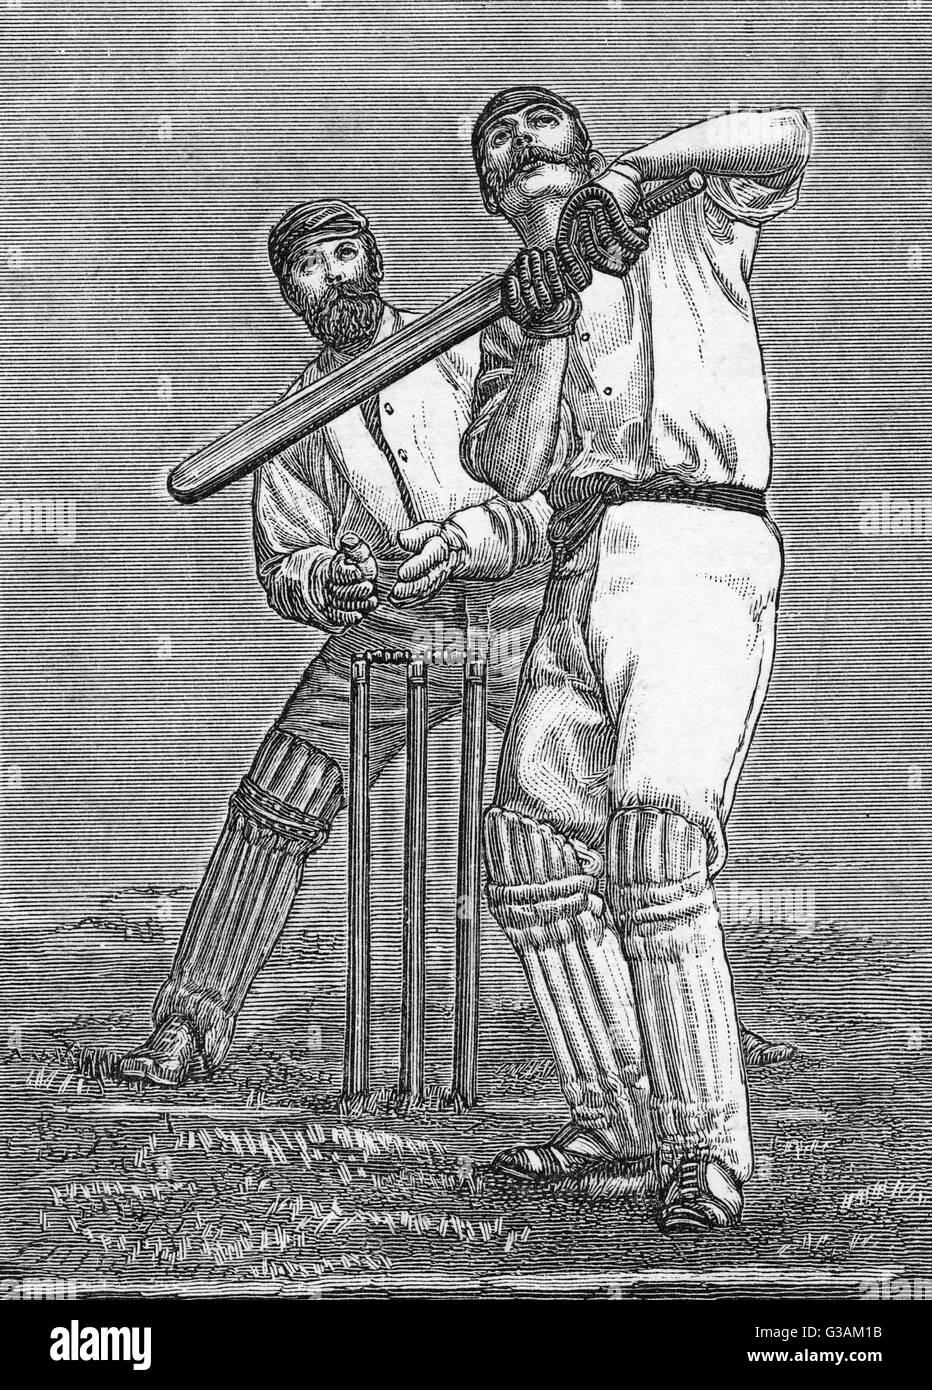 Un pokey batsman tratando con un alto cayendo full-tono. Fecha: 1888 Foto de stock